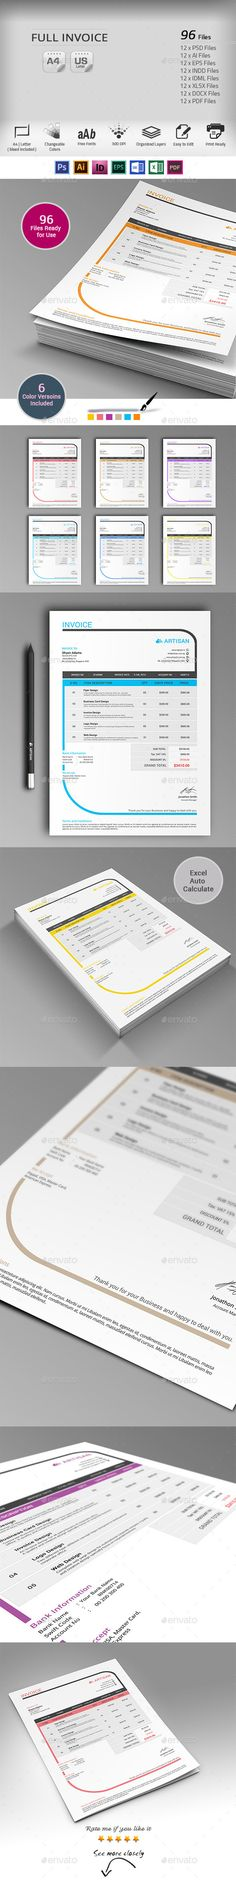 Invoice Template   #invoice #invoicetemplate   Download: http://graphicriver.net/item/invoice/10091006?ref=ksioks